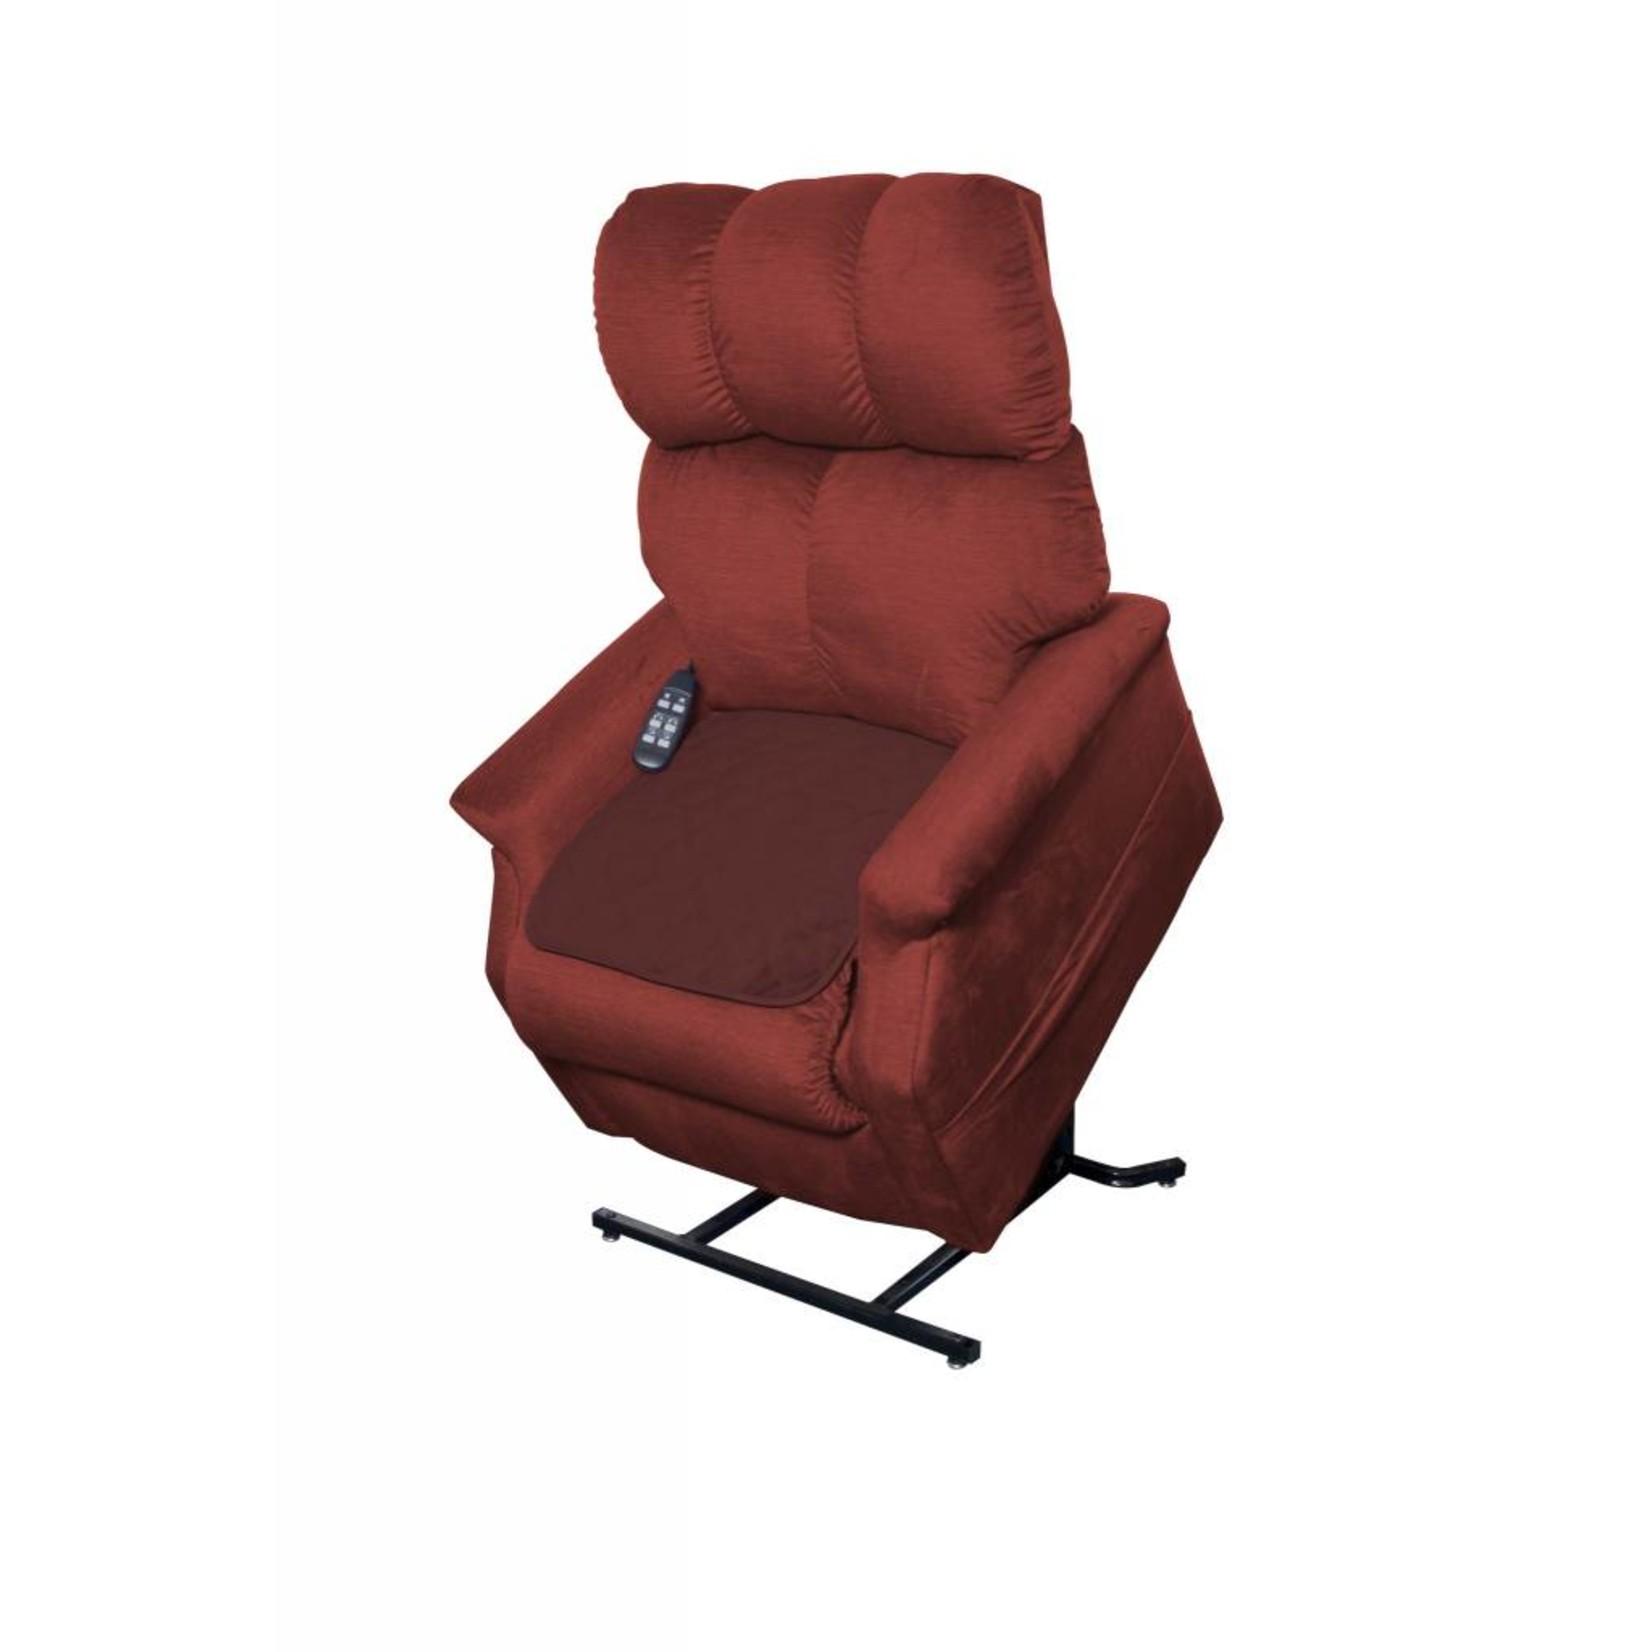 Essential Medical Furniture pad 20x20 Maroon